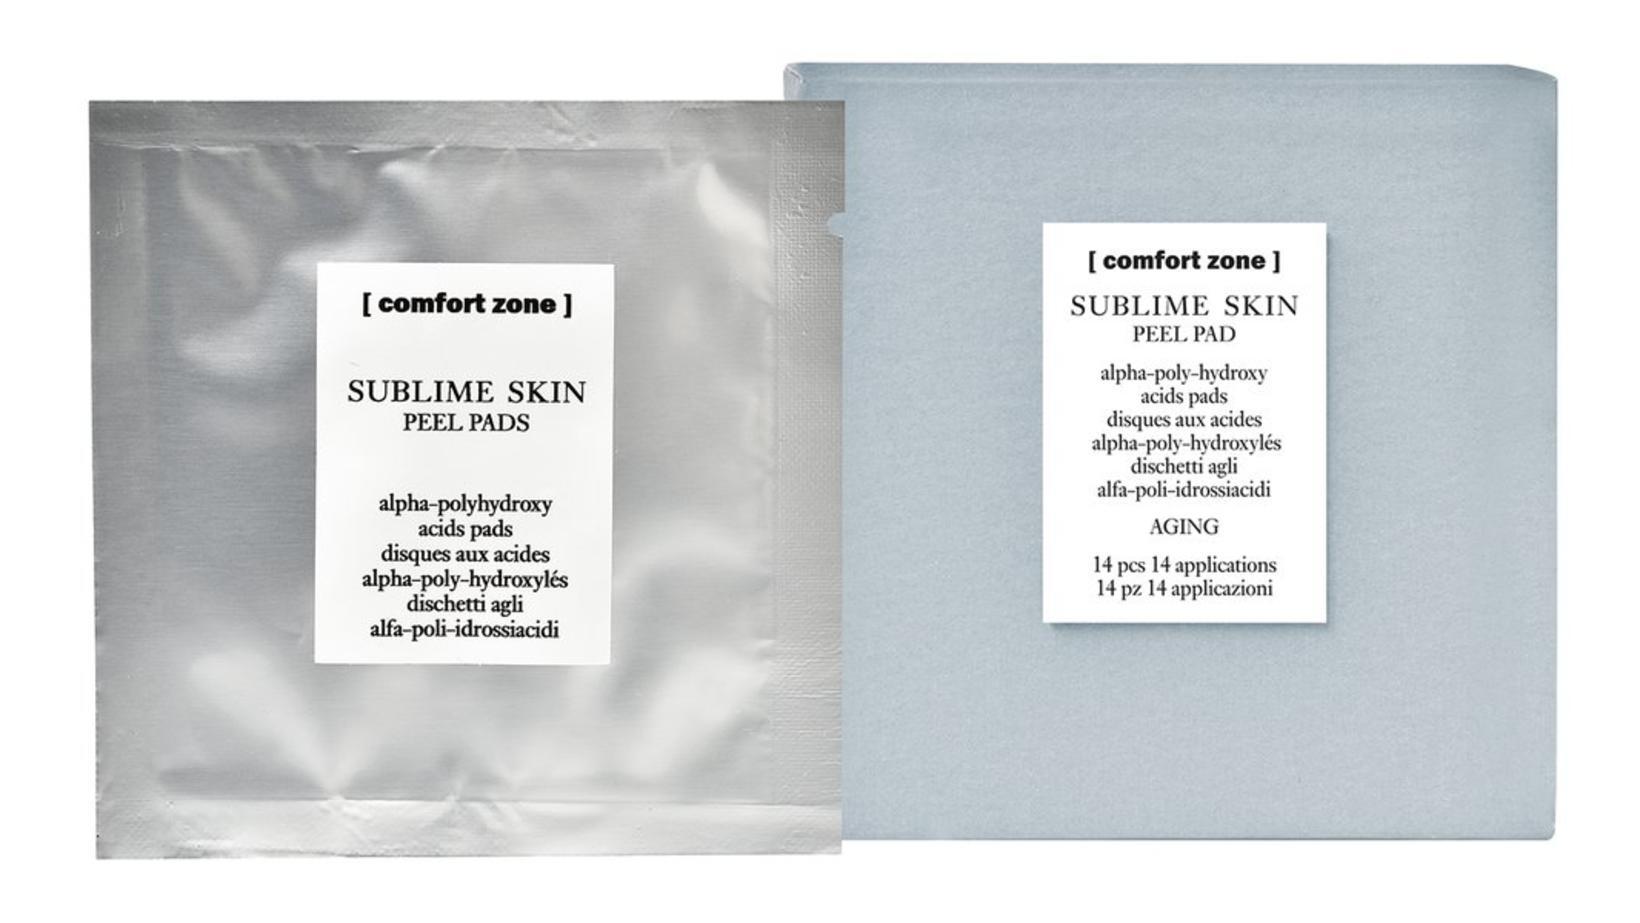 Comfort Zone Sublime Skin Peel Pads.